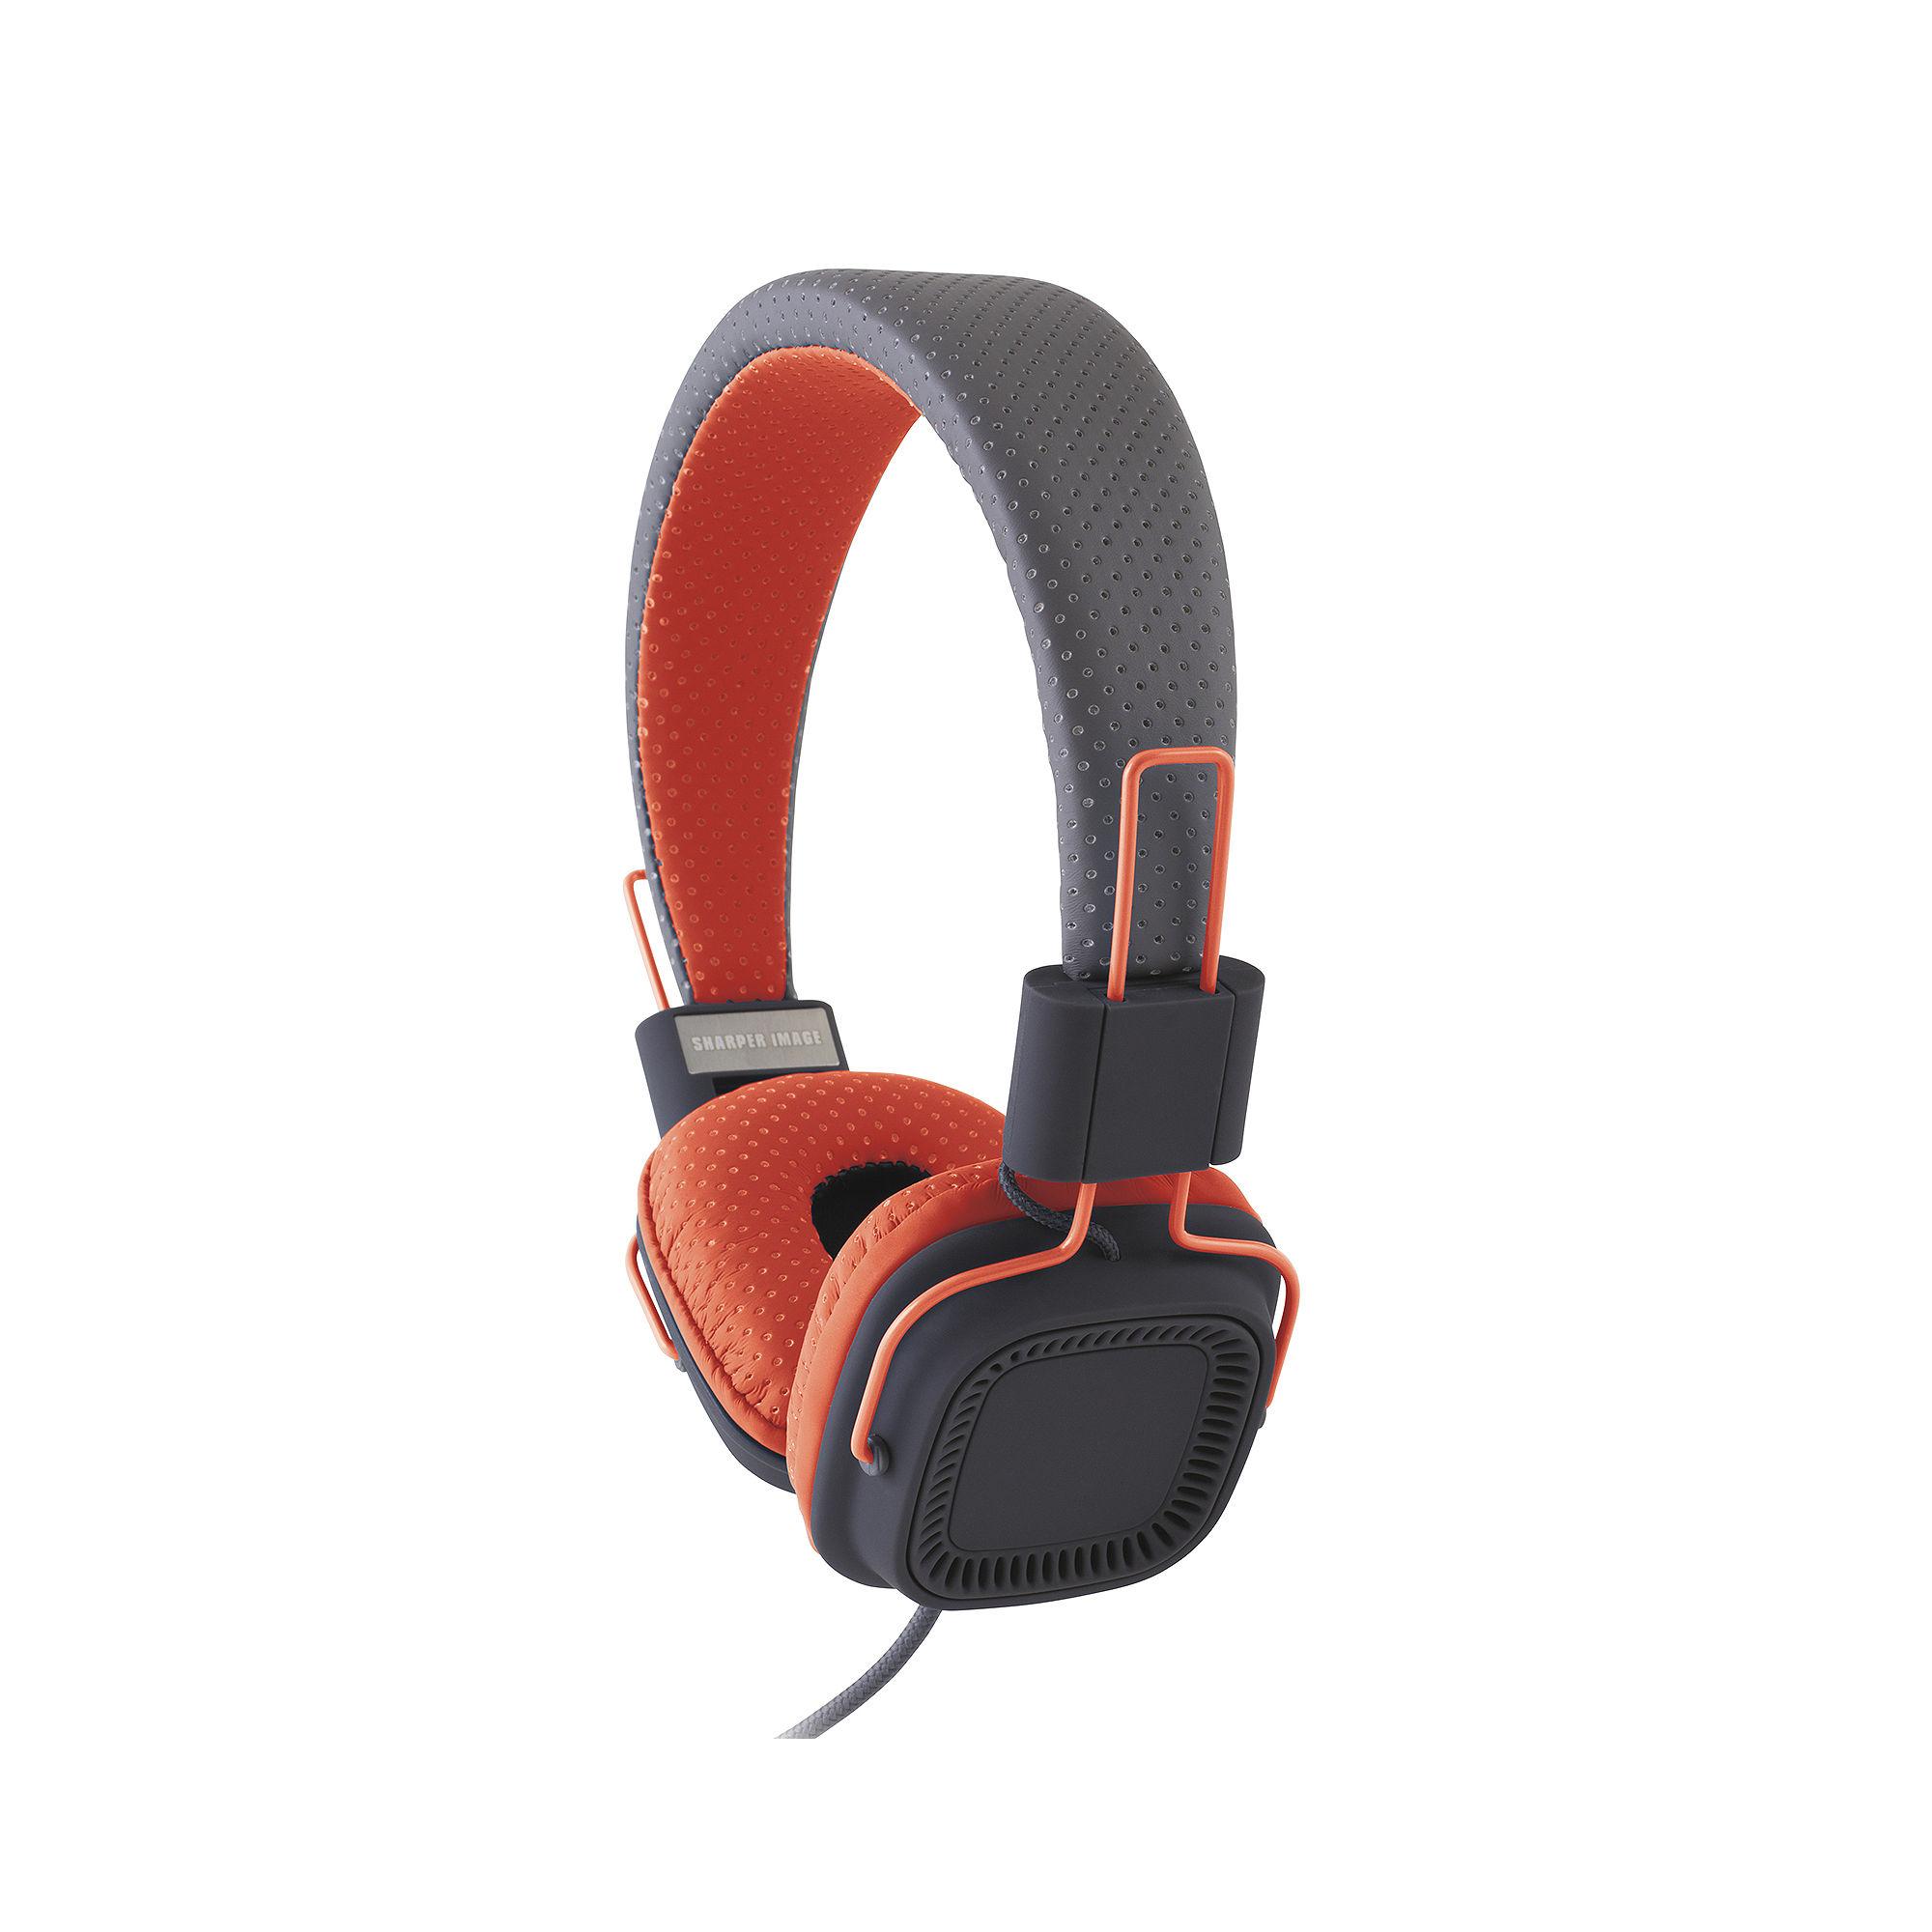 Sharper Image Bluetooth Wireless Earbuds: Search Sharper Image Quiet Place Noise Cancellation Headphones Fj454 B000xg3qcu